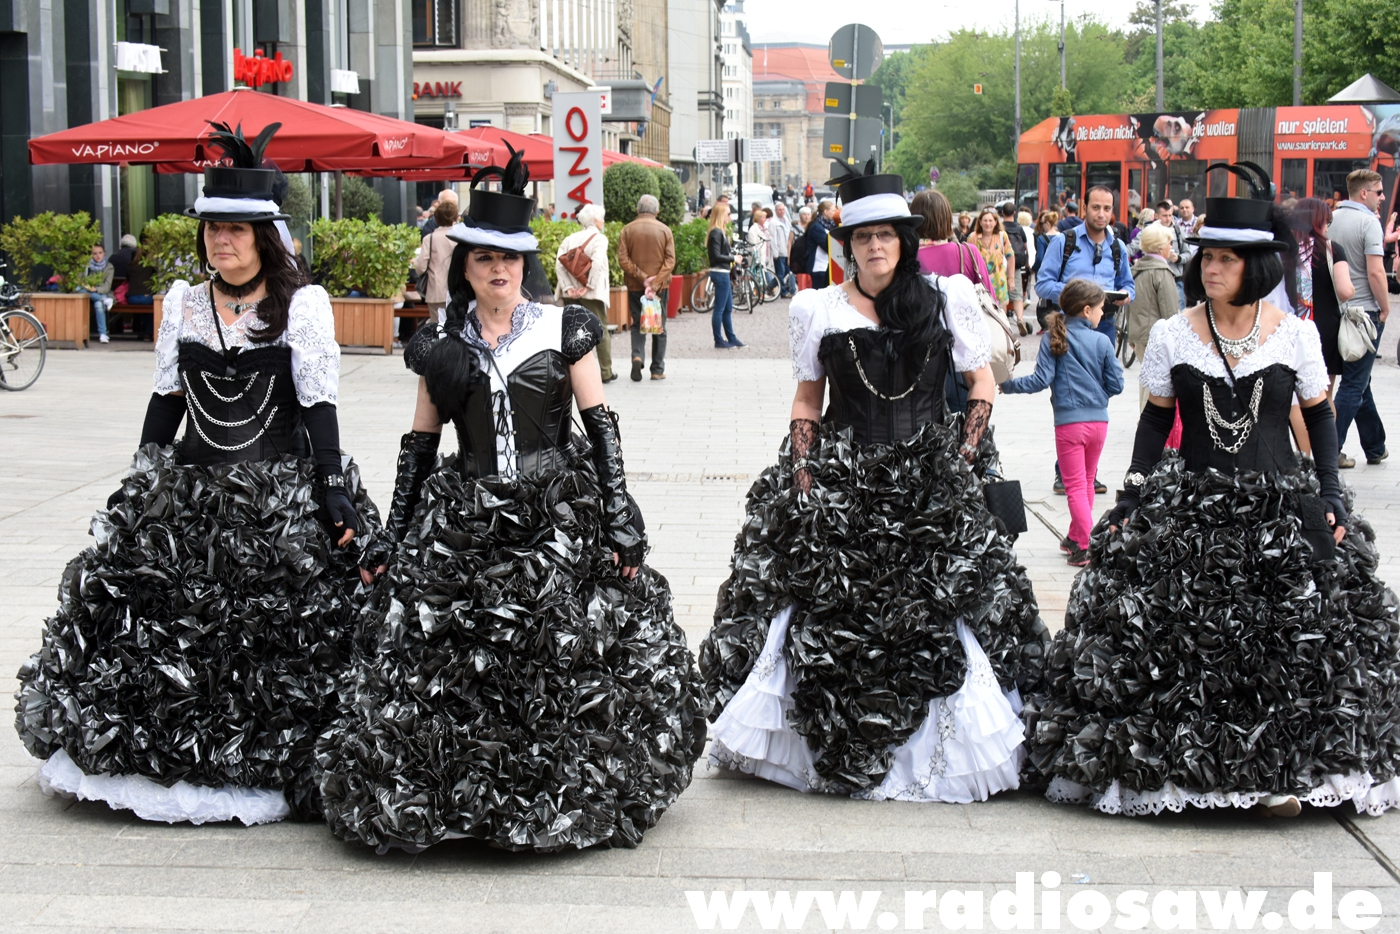 Wave-Gotik-Treffen - Photos - Cake Dresses